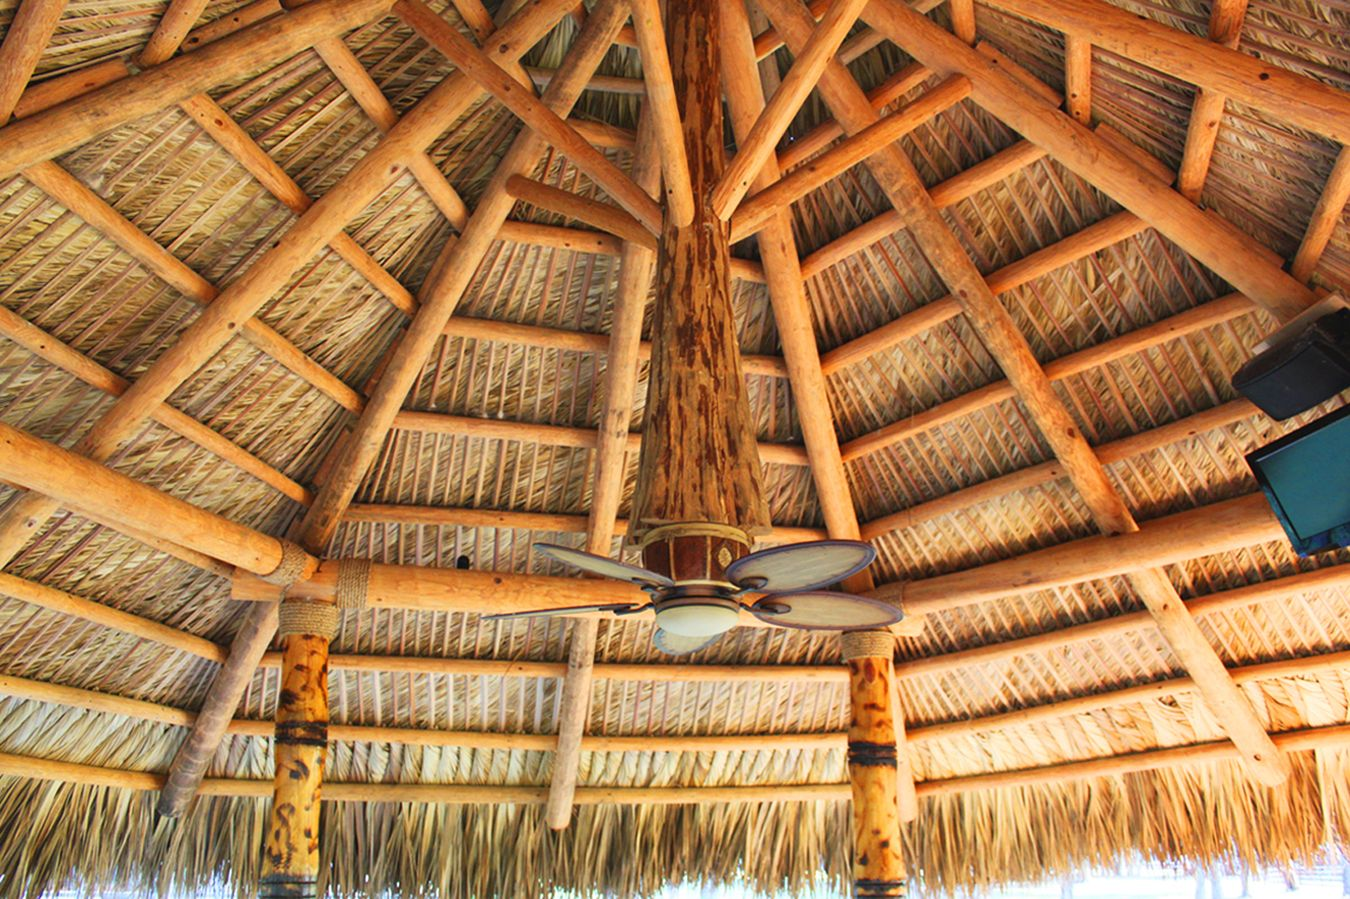 tiki hut and bar in ocala fl on horse farm tiki huts in florida